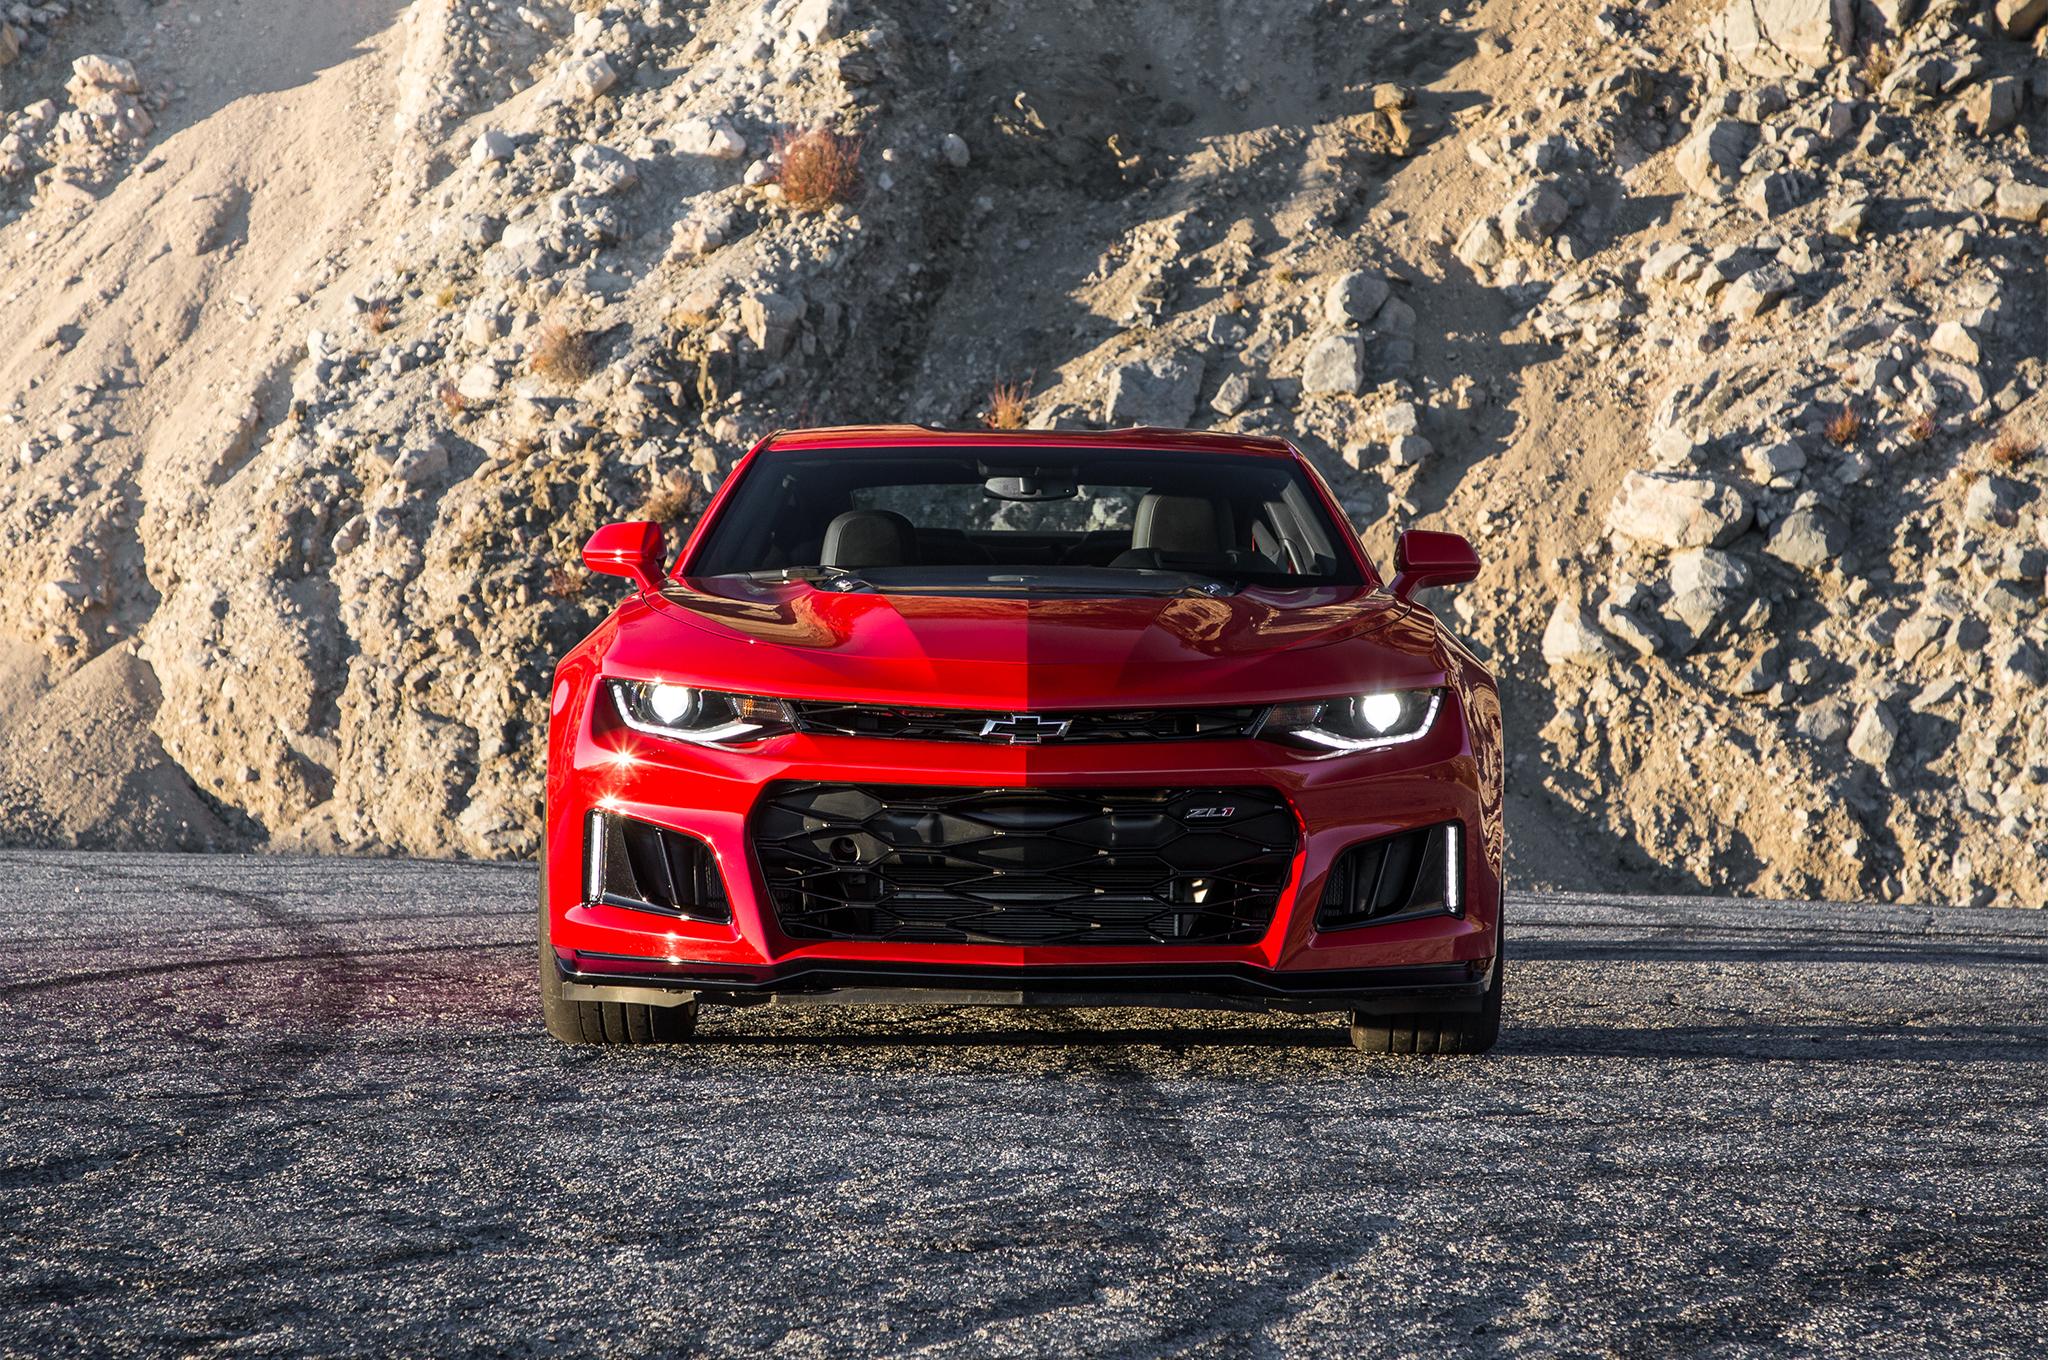 2017 Ford Raptor Hd Wallpaper 2017 Chevrolet Camaro Zl1 Red Wallpaper Hd Wallpaper